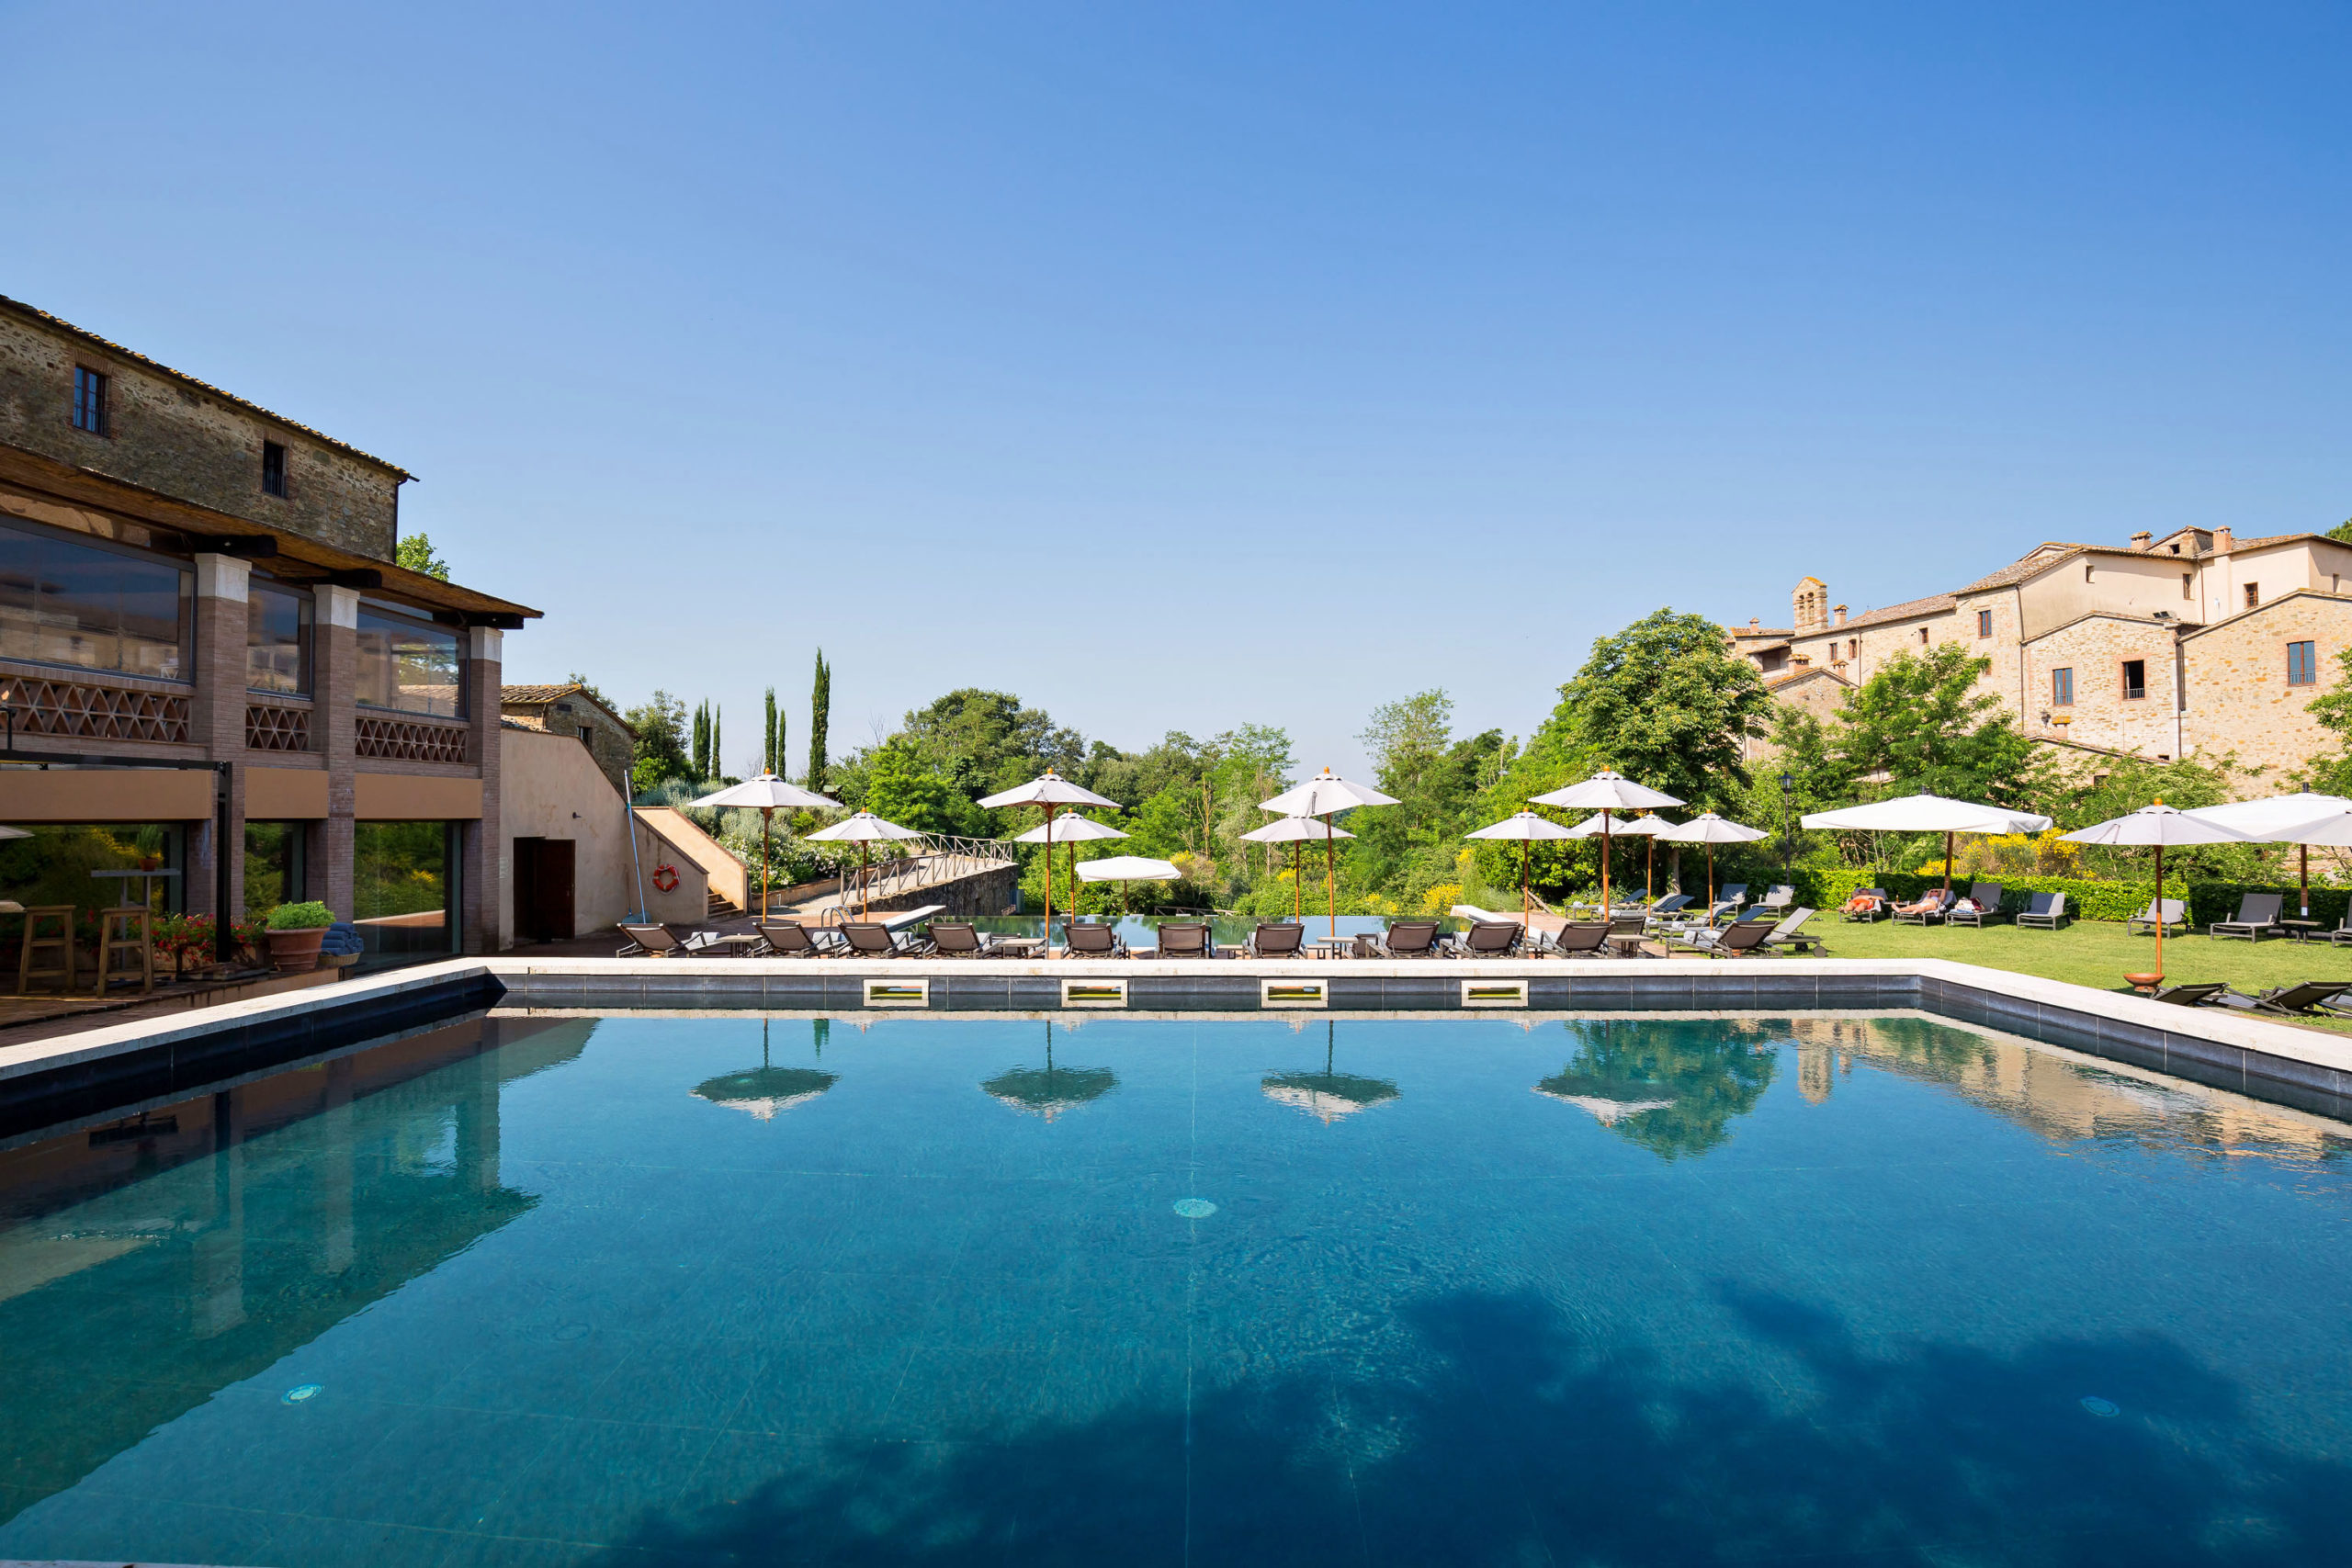 La piscina esterna di Castel Monastero